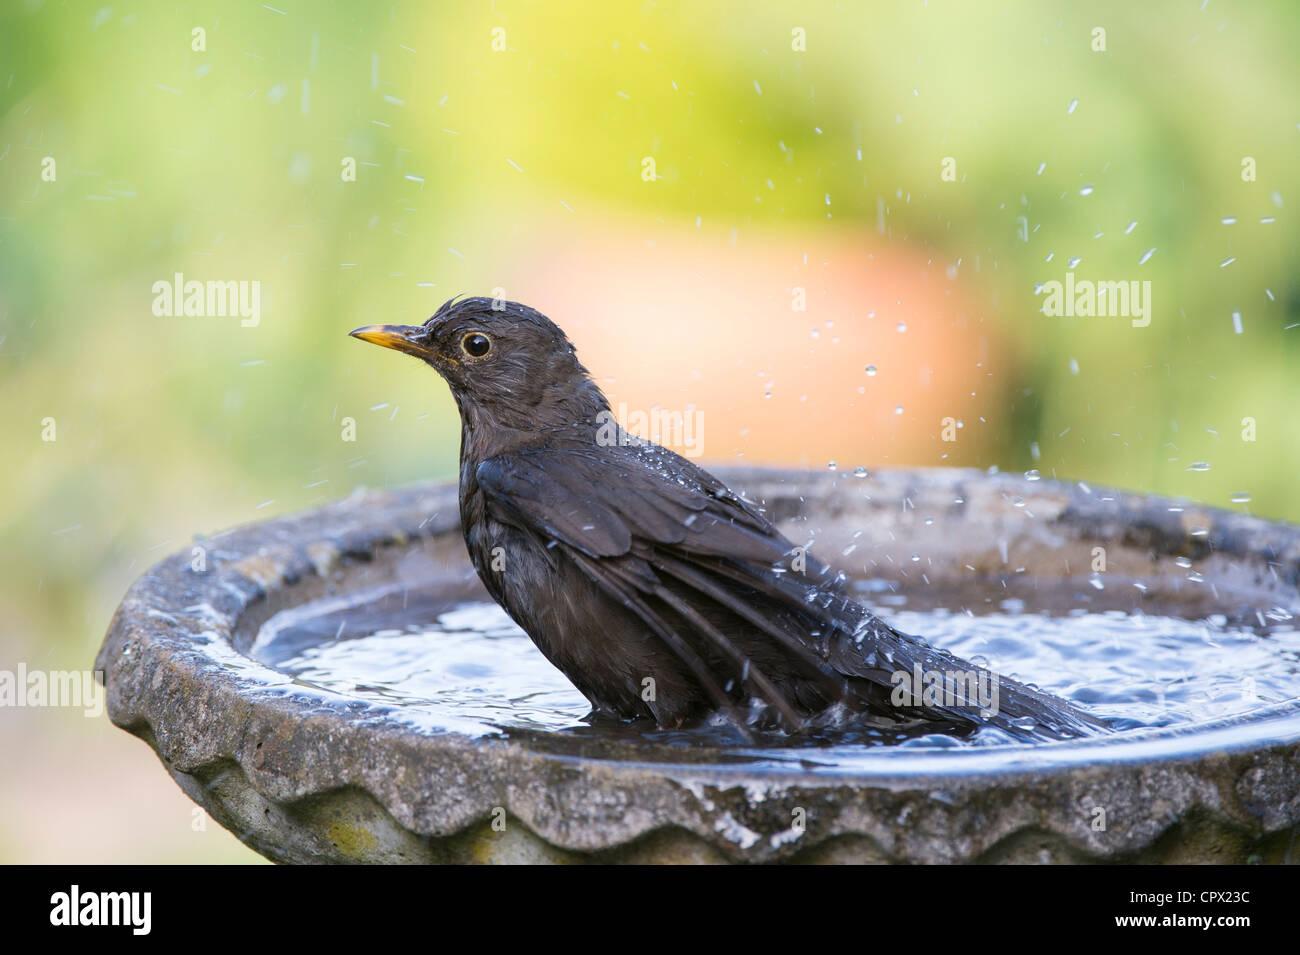 Turdus merula . Female blackbird washing in a bird bath - Stock Image